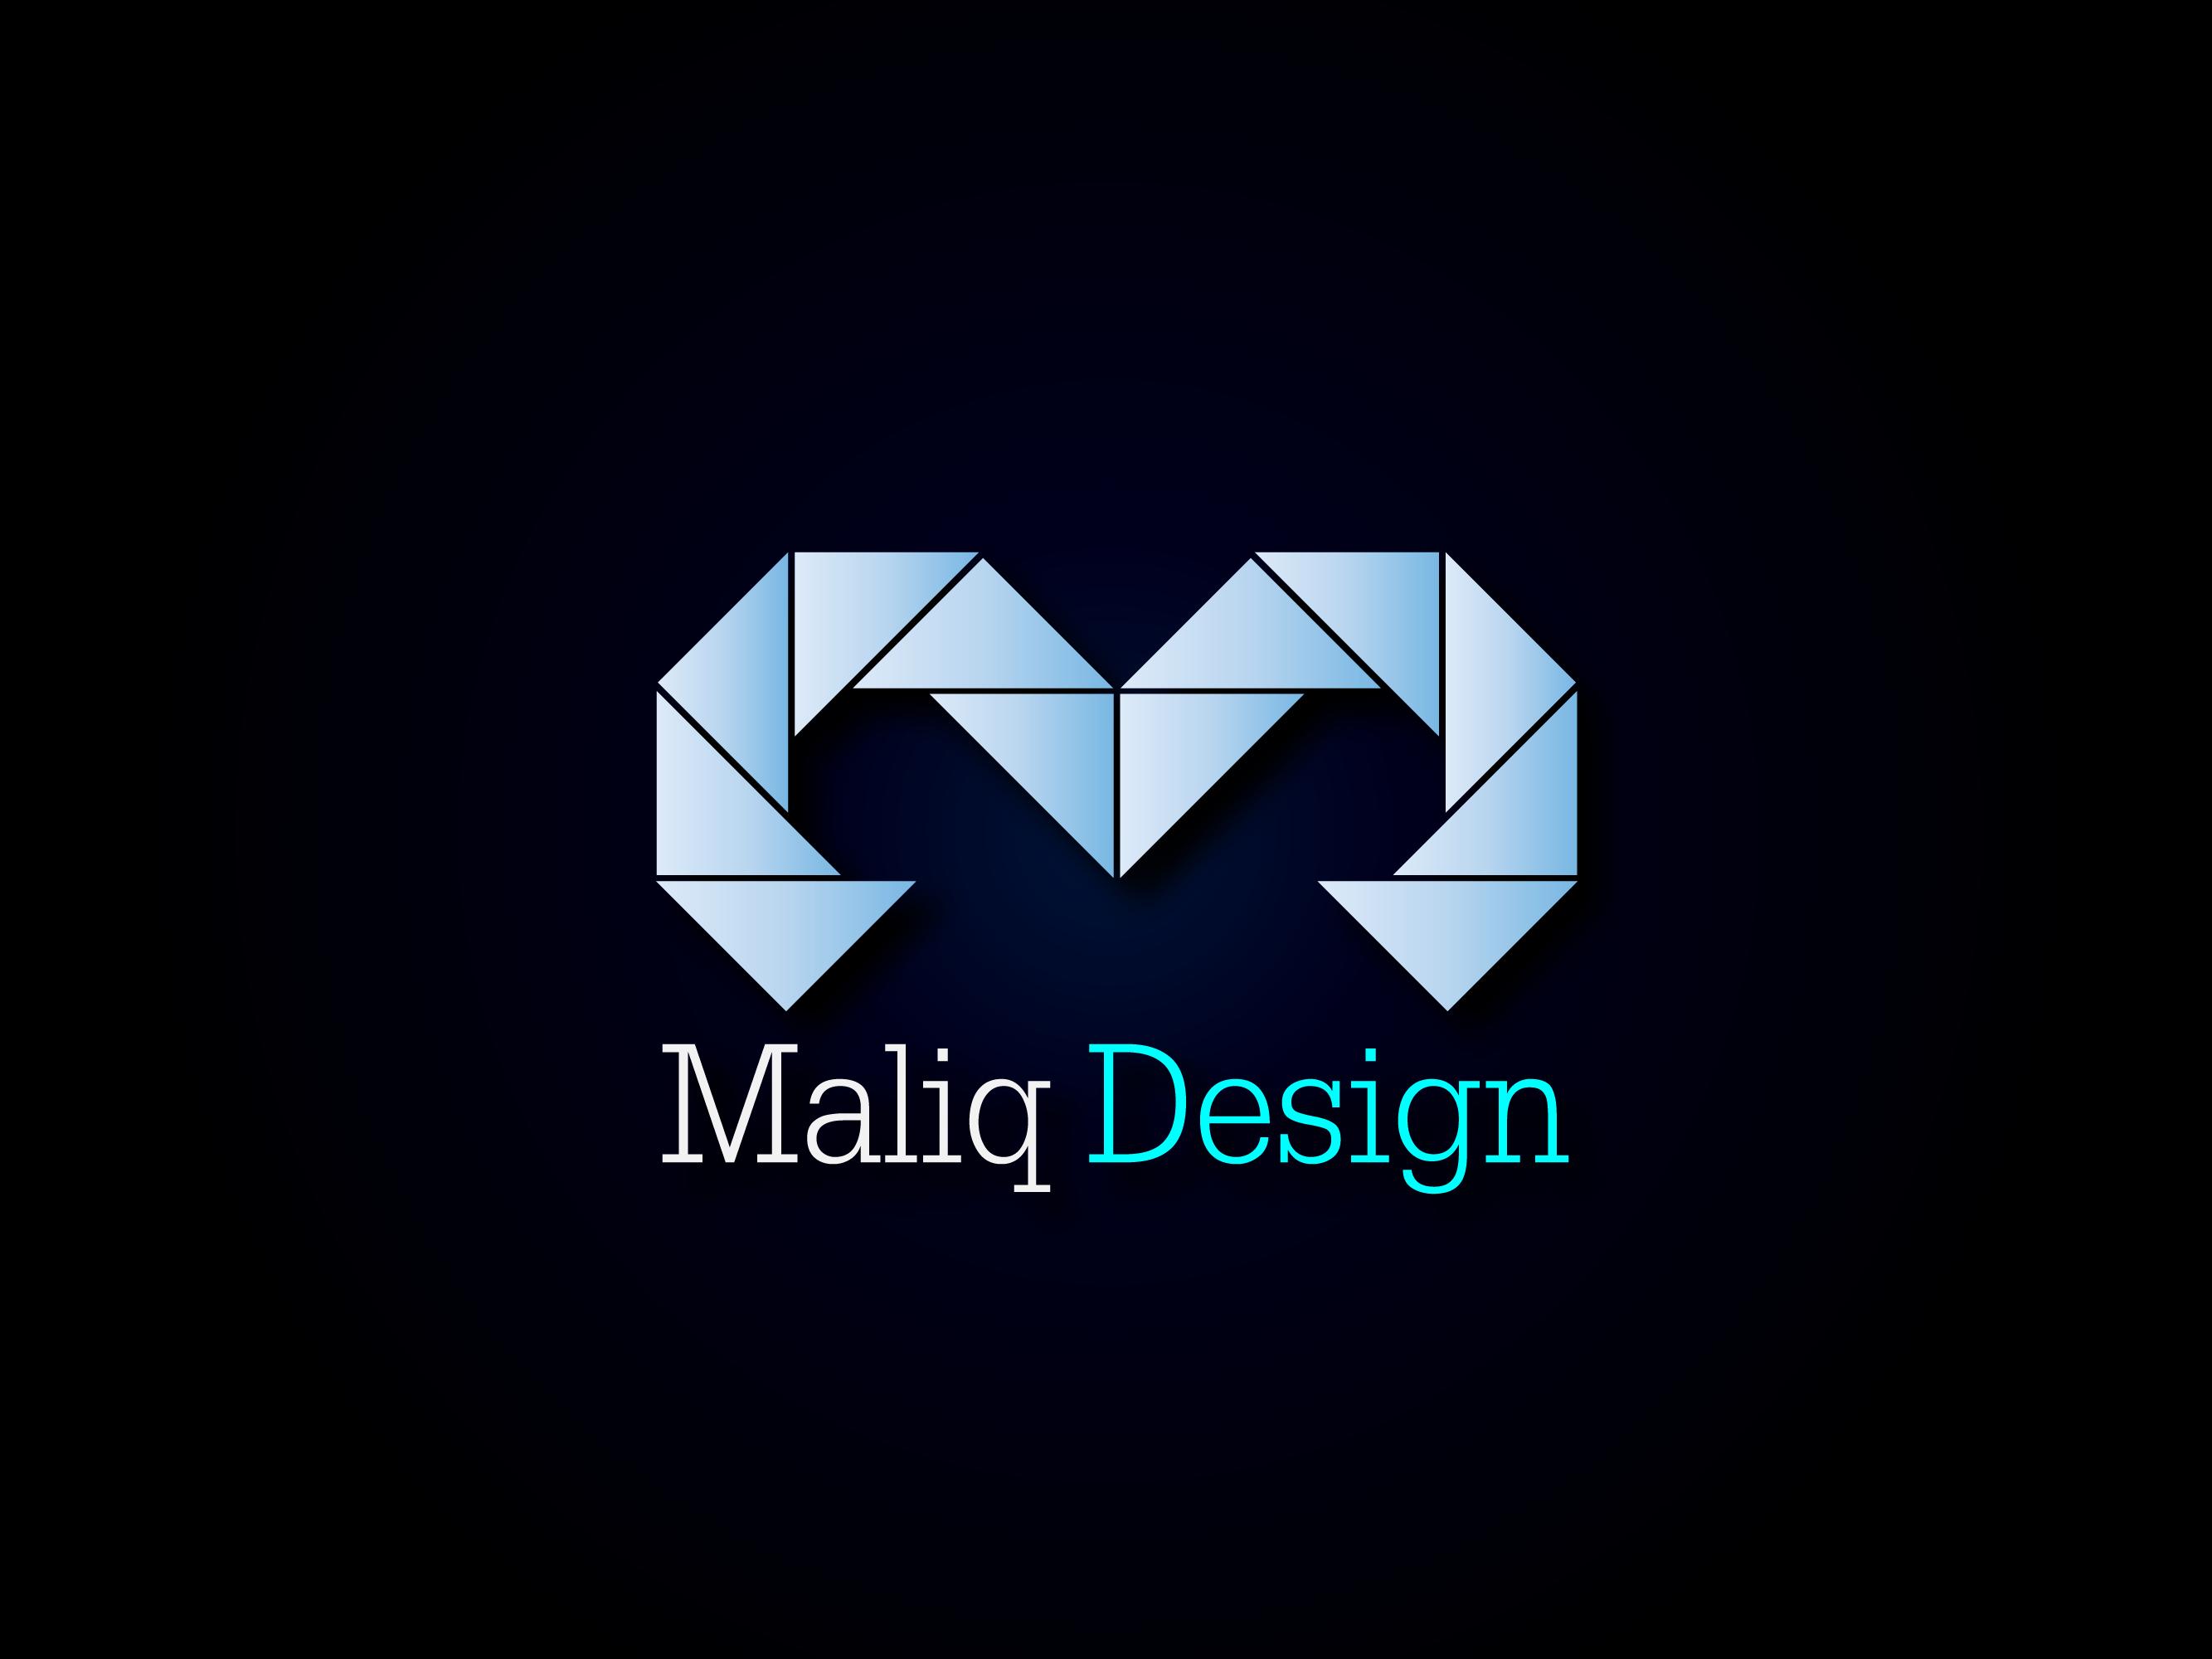 Malik design